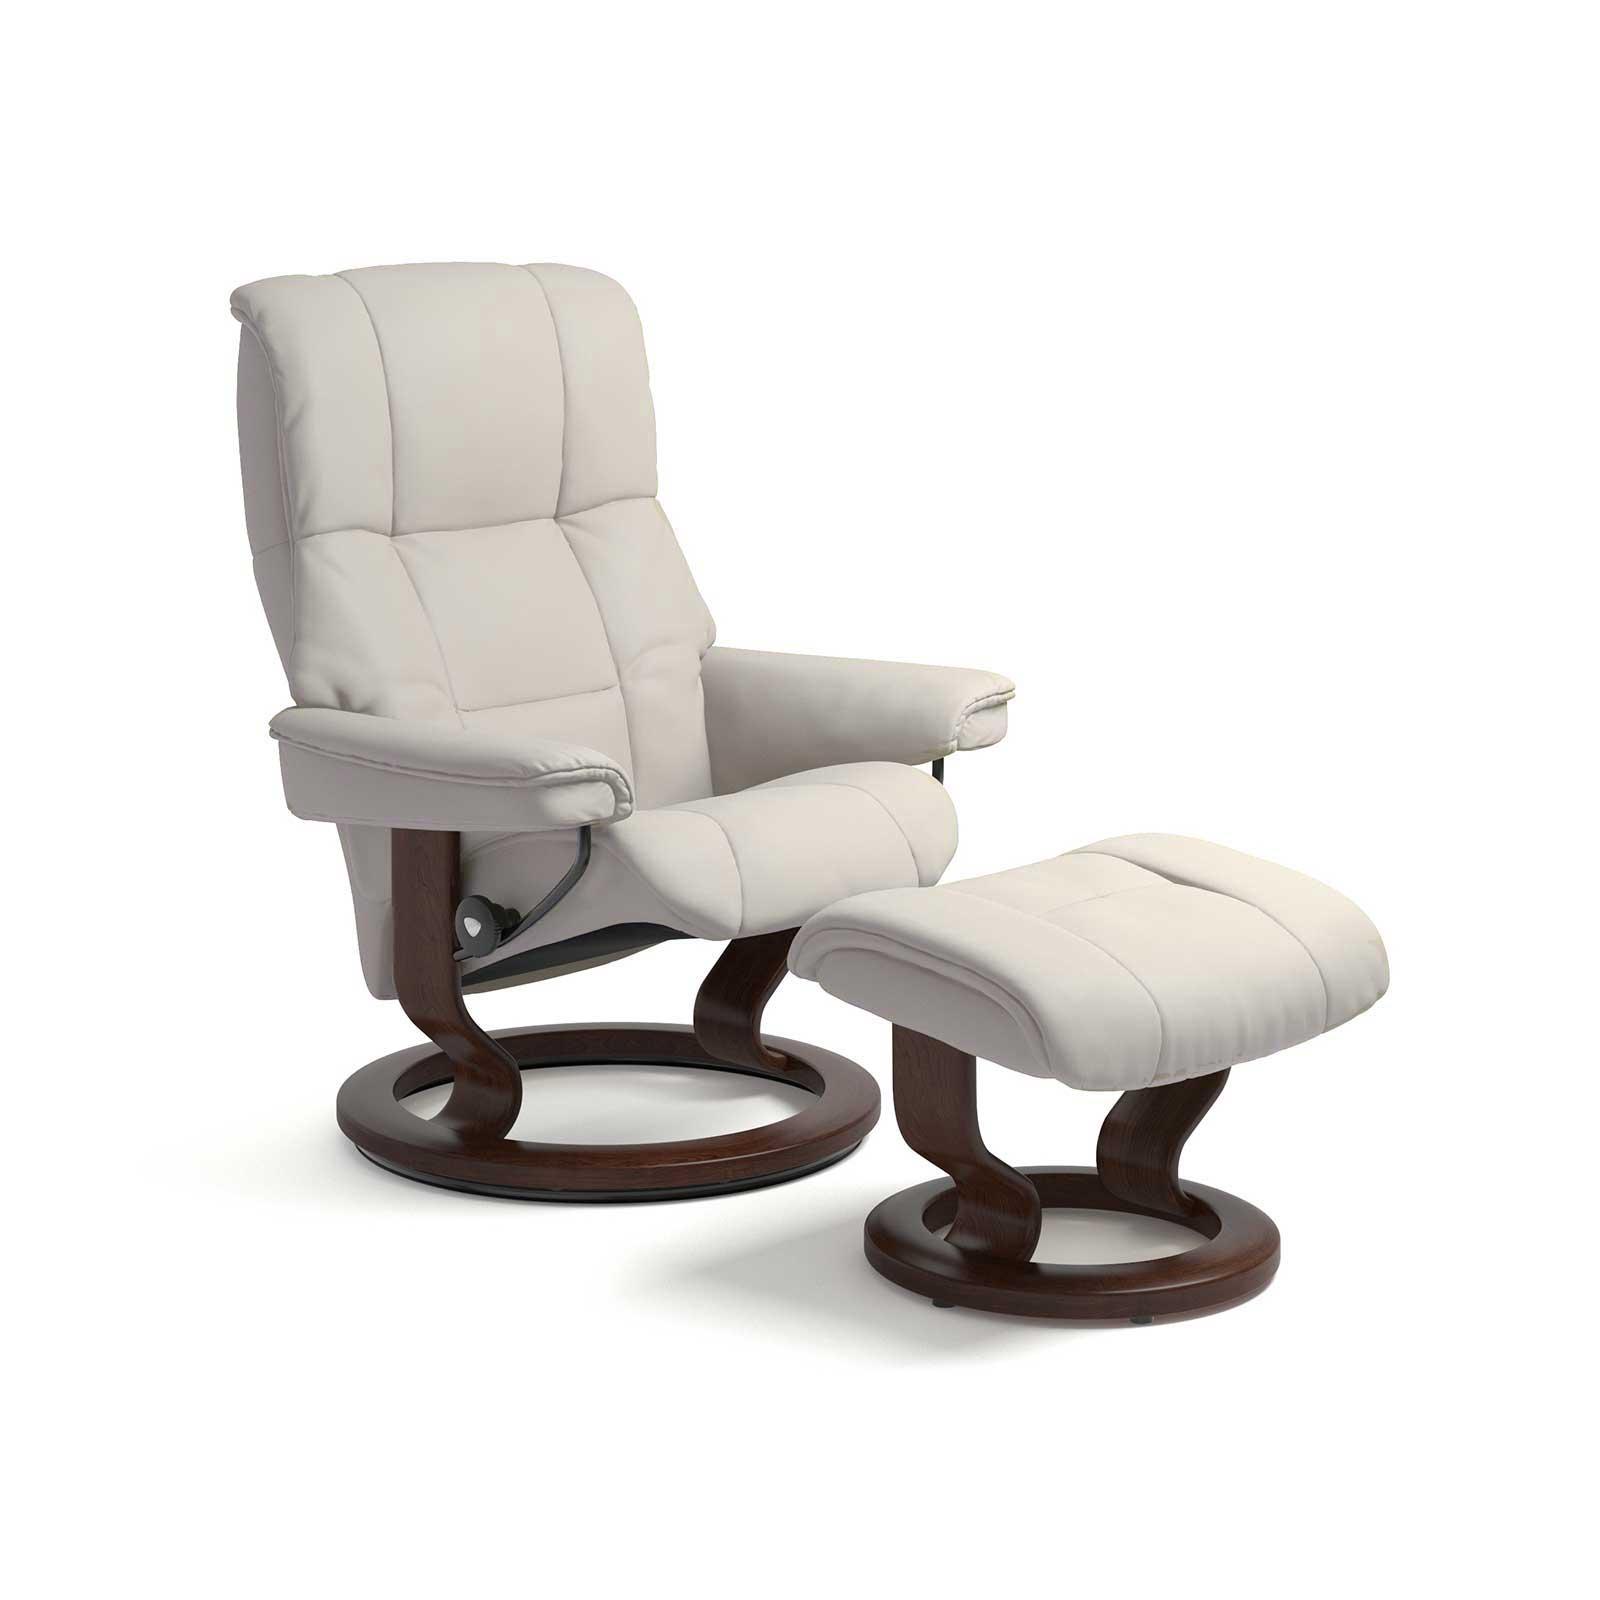 stressless sessel mayfair paloma light grey classic braun hocker. Black Bedroom Furniture Sets. Home Design Ideas